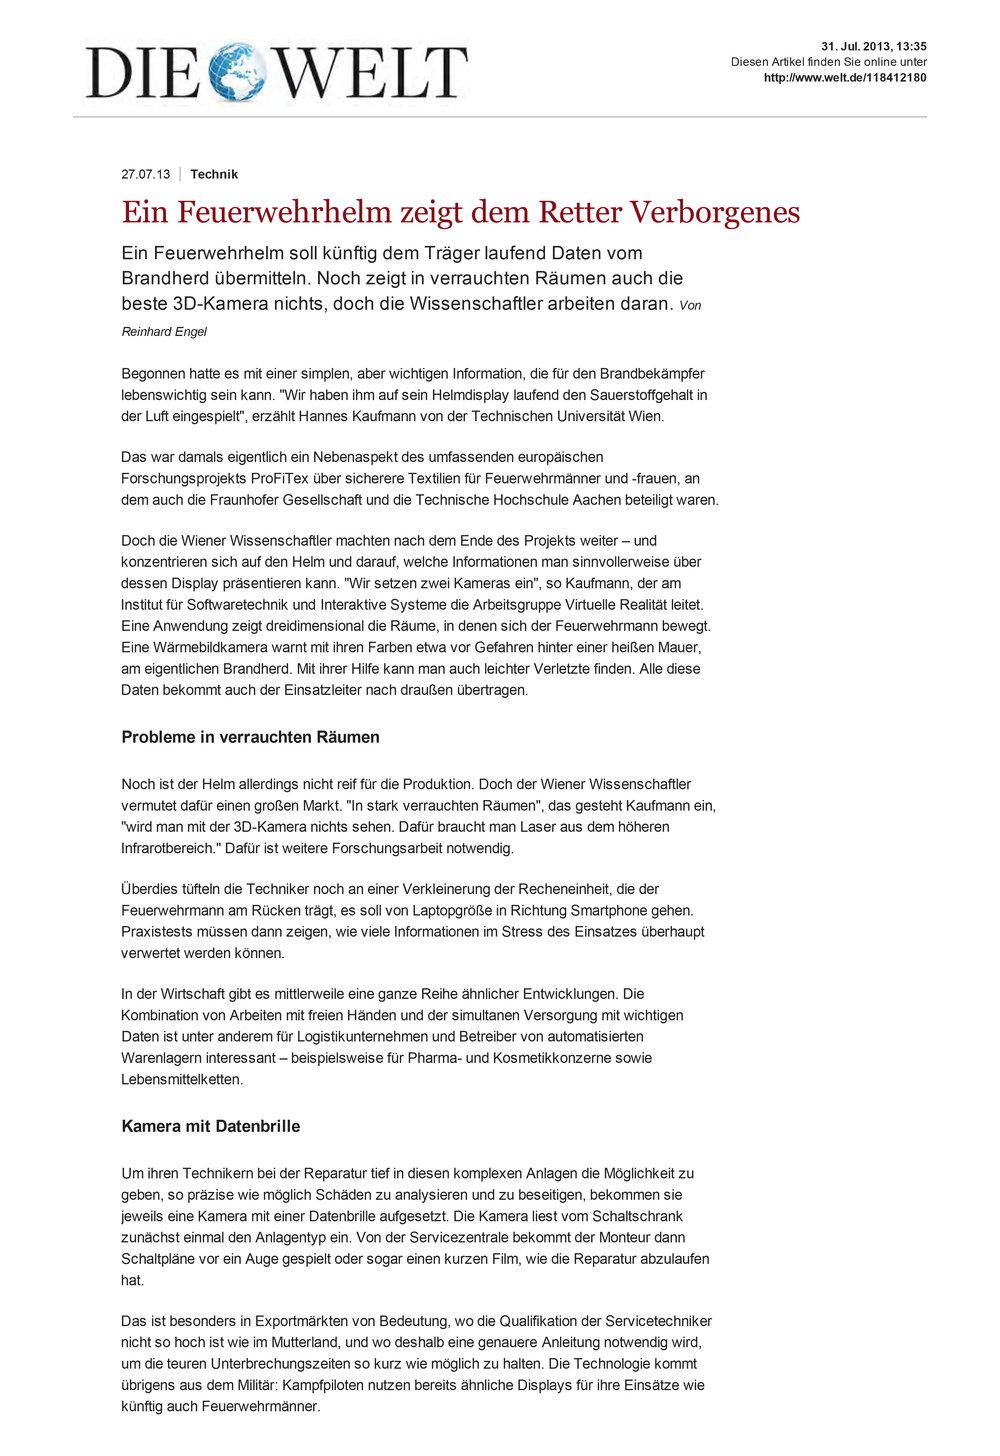 manggei-communications---presse-clippings-komplett---journalistenreise-2013_-20.jpg